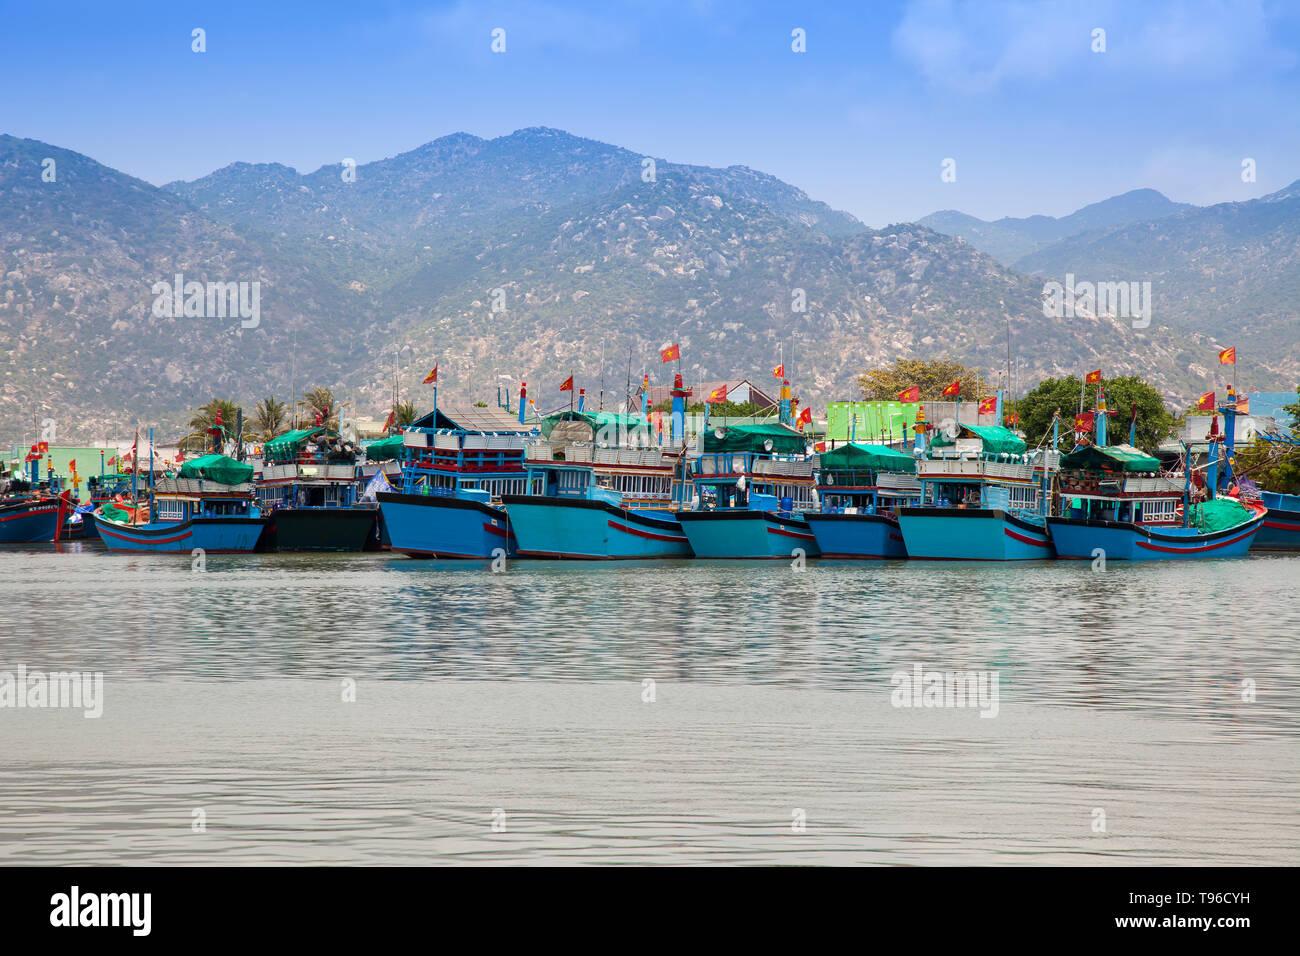 Vietnamese fishing boats in the port near Cana,south china sea,Vietnam,asia - Stock Image